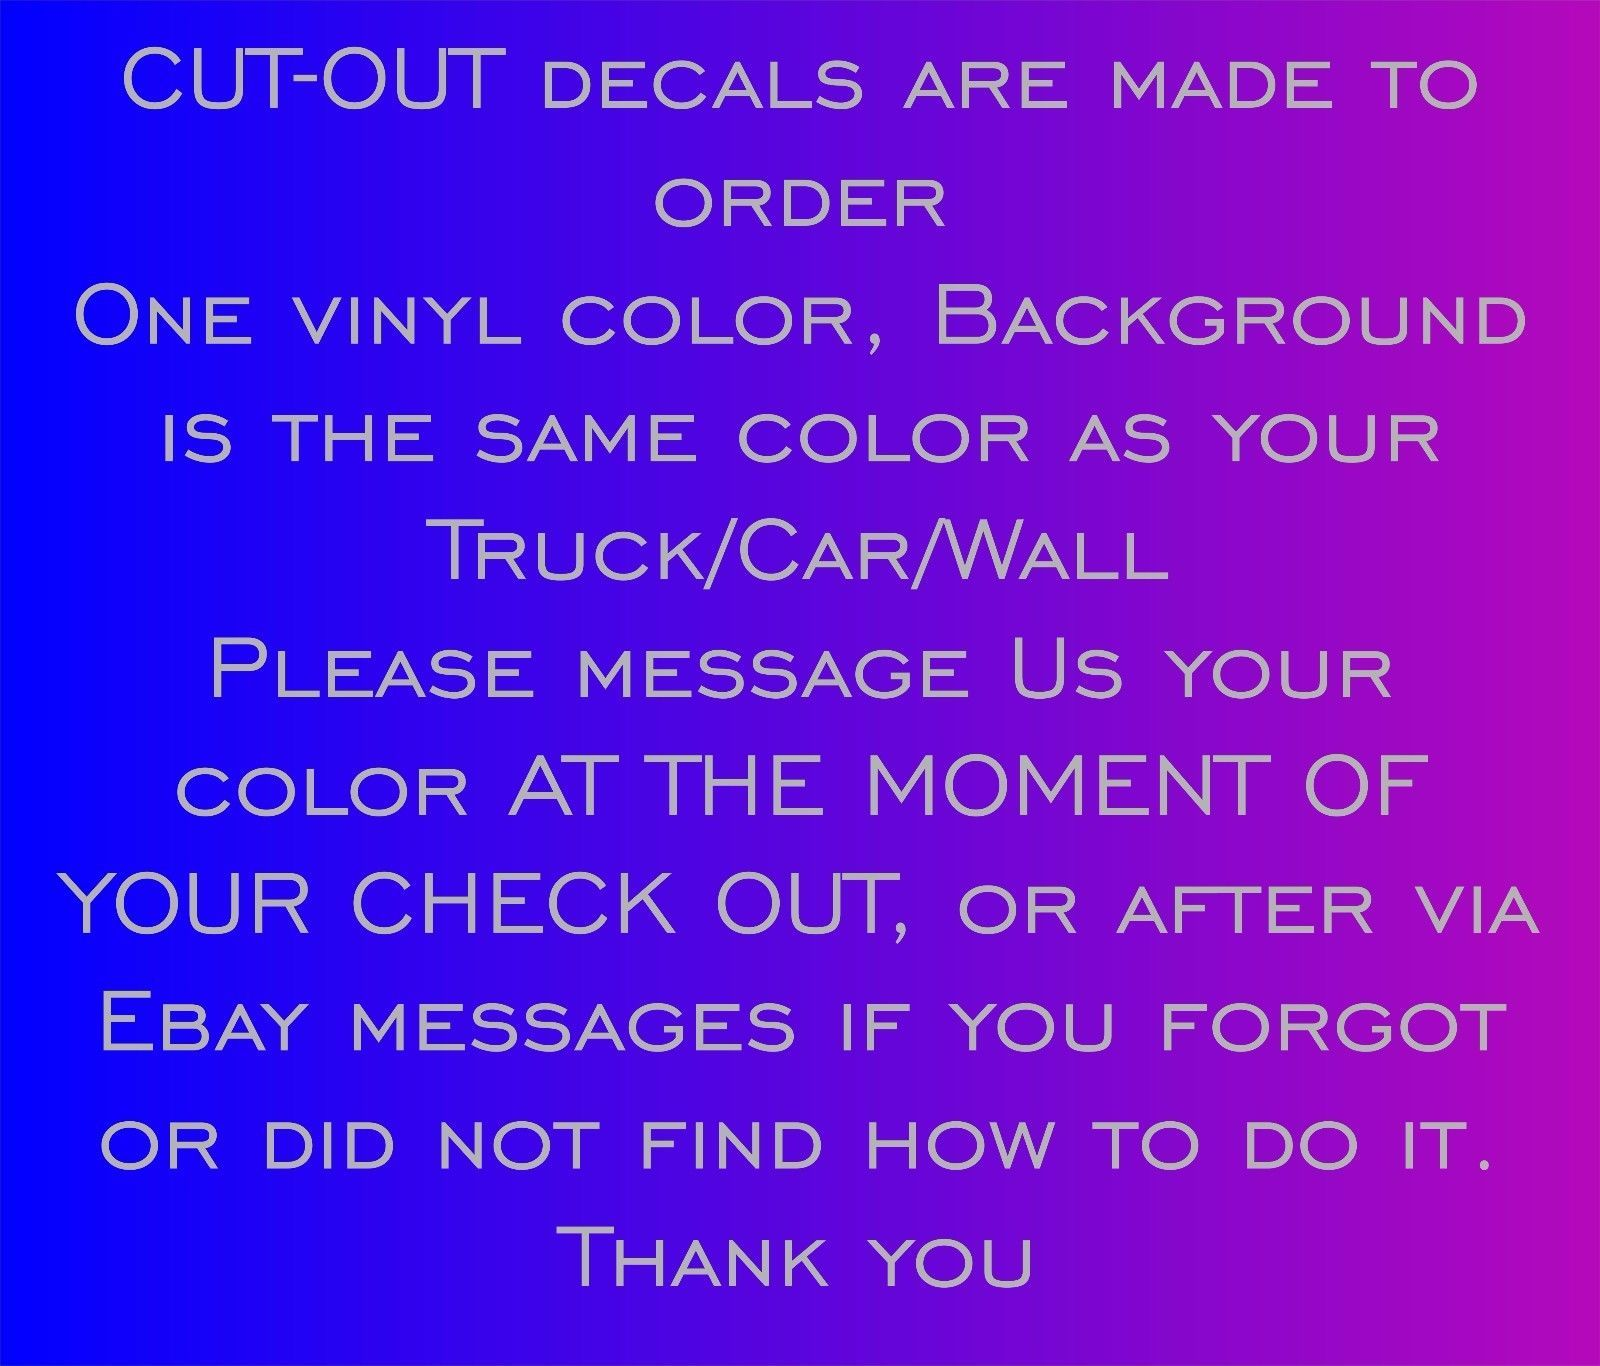 x2 Dodge Ram Rebel 1500 5.7 L decals side stripes vinyl stickers Hemi Graphics